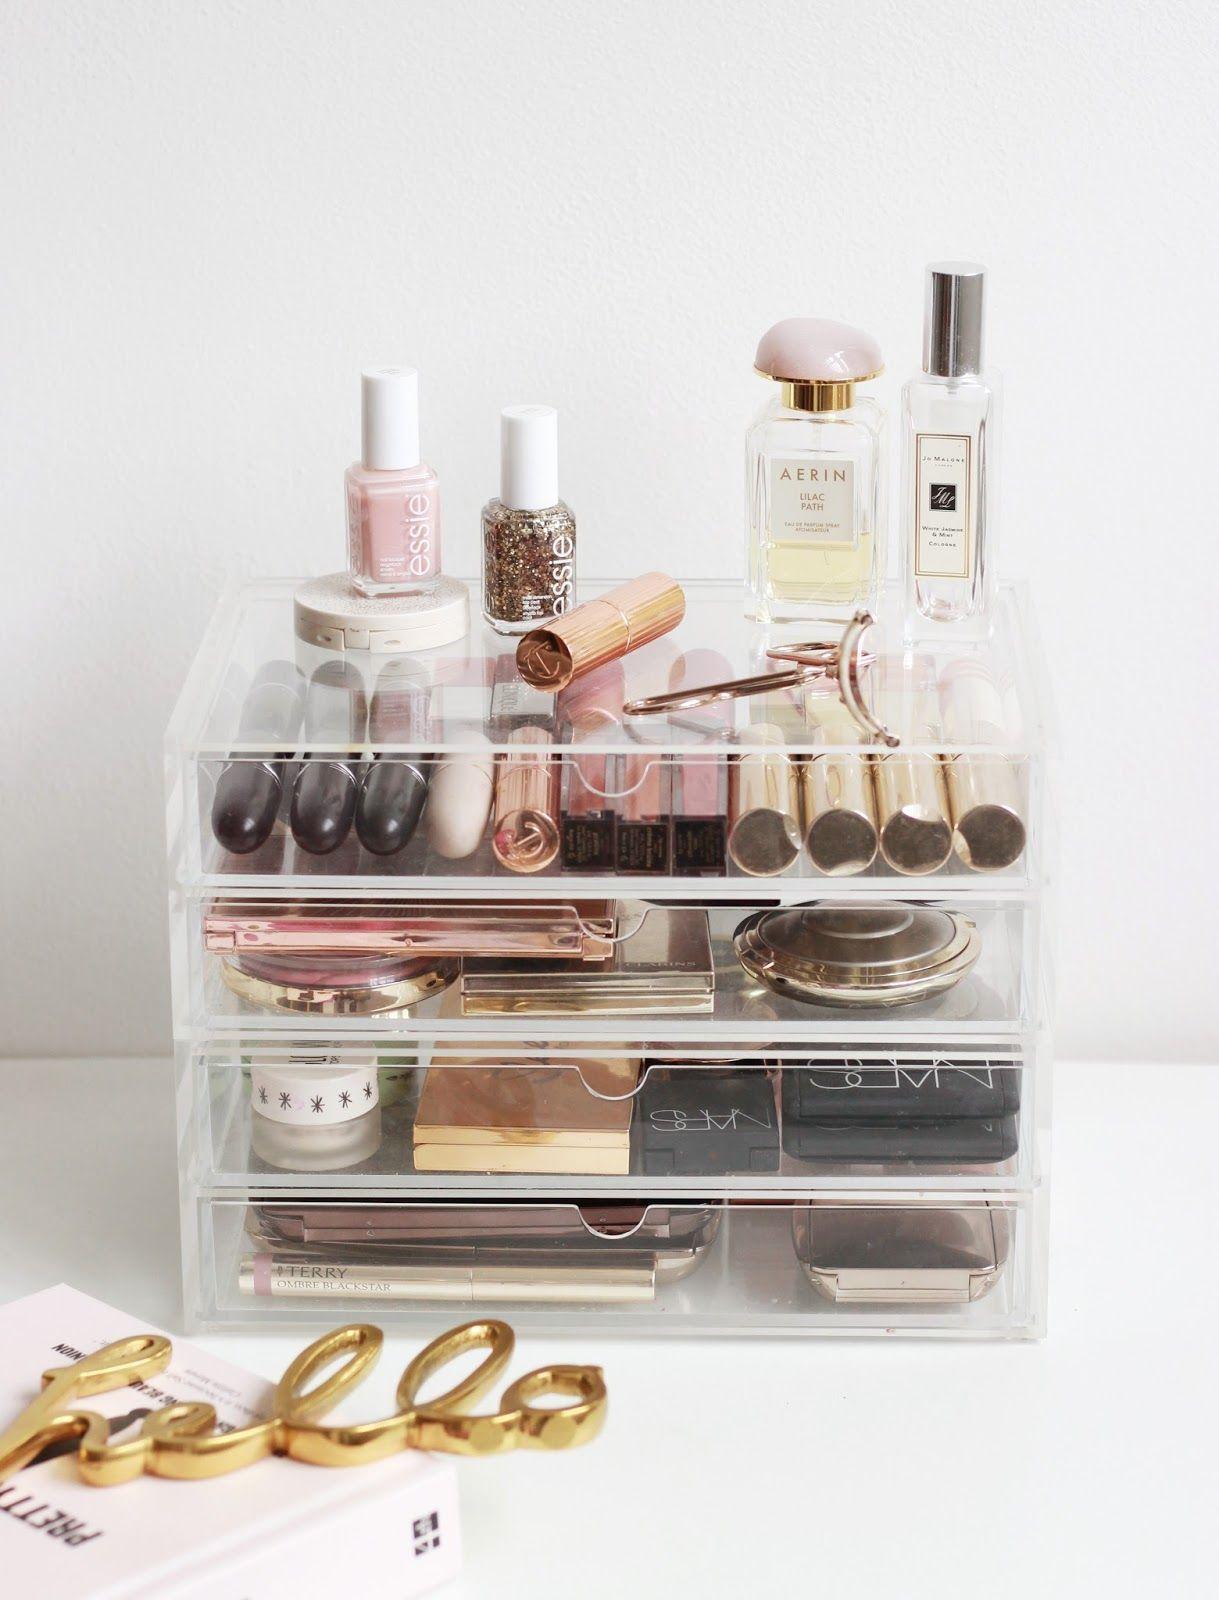 A Muji Makeup Storage Overhaul Muji Makeup Storage Makeup Storage Makeup Storage Organization